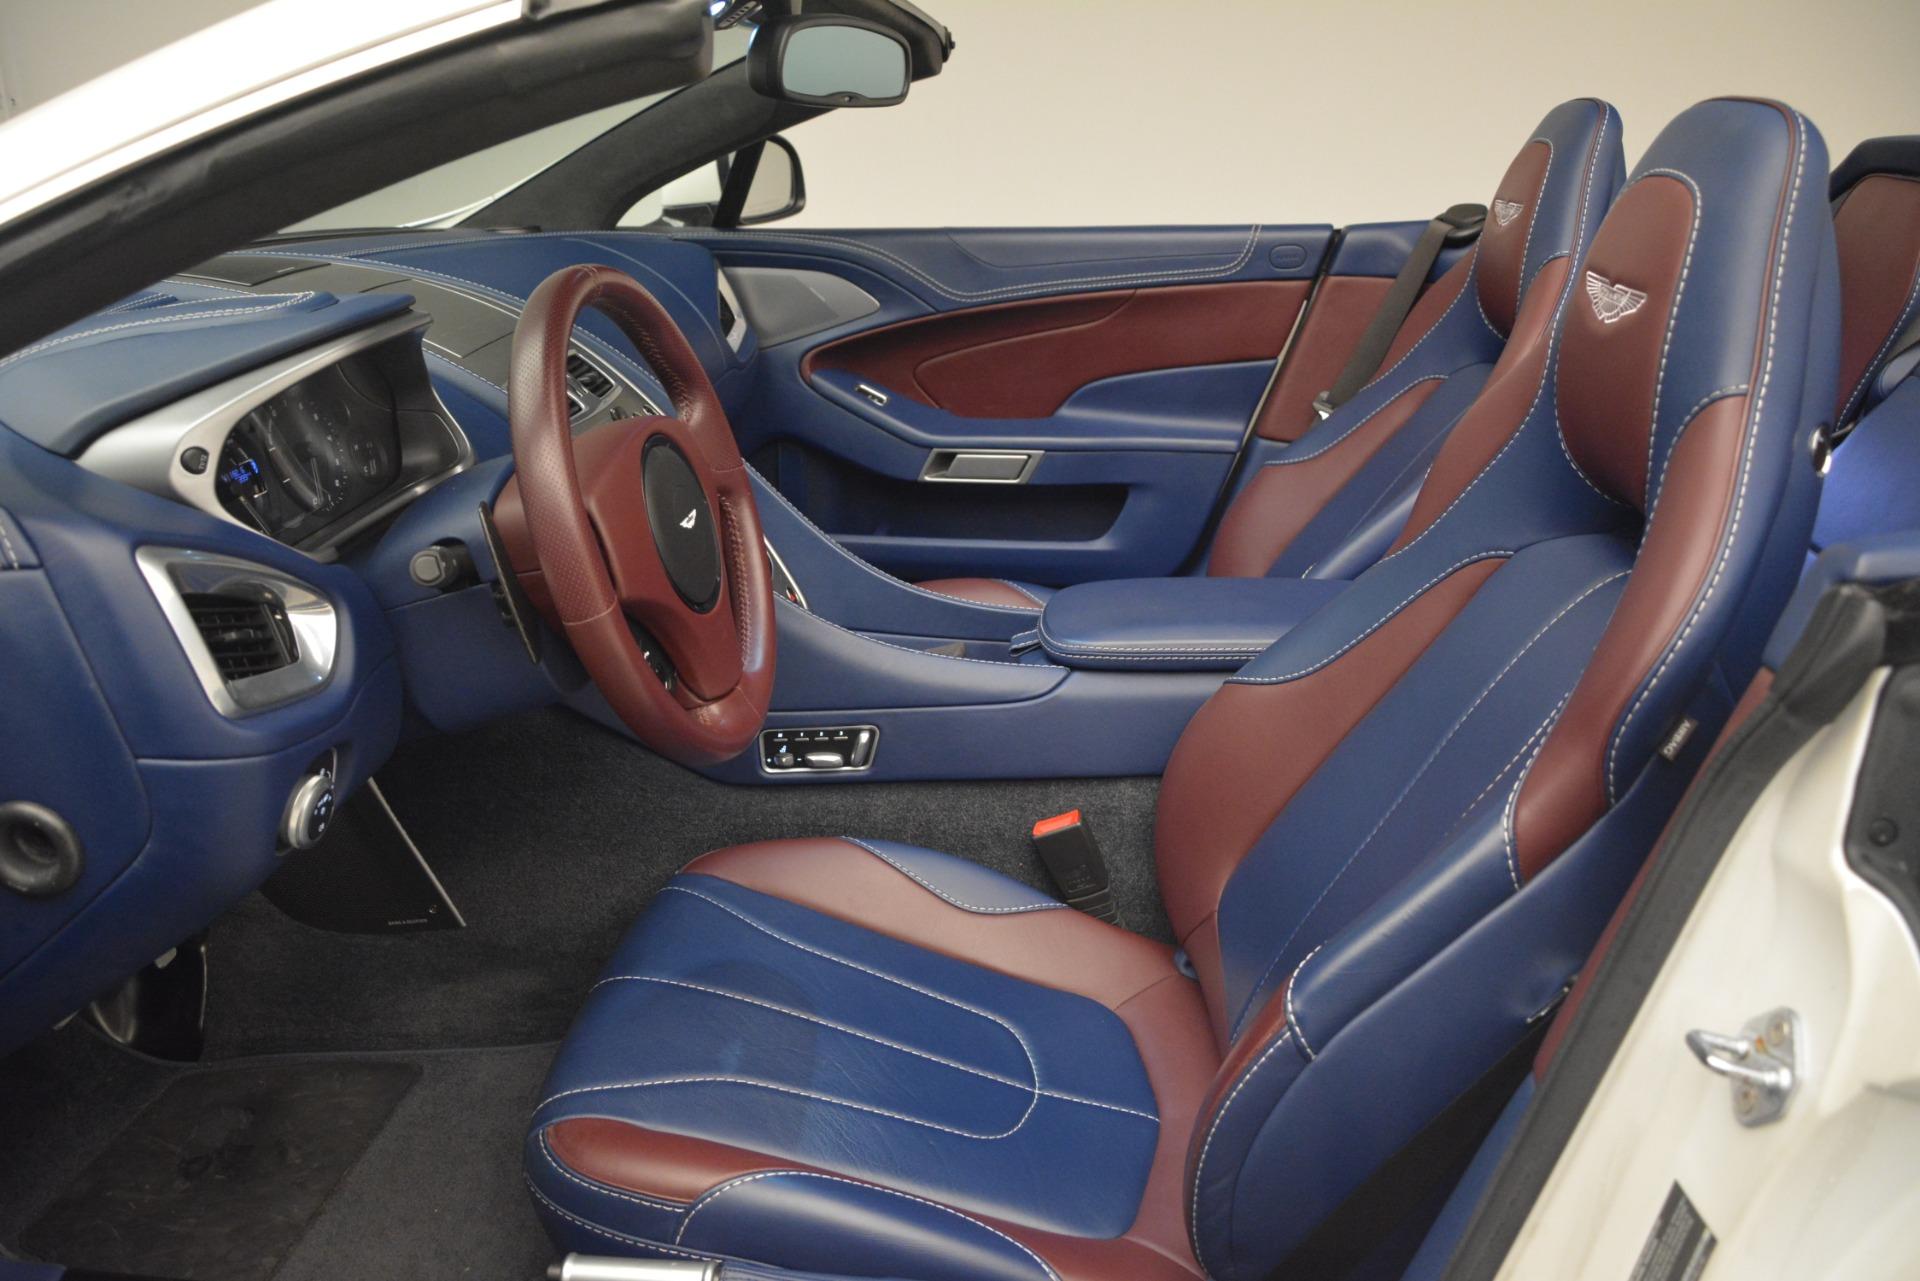 Used 2015 Aston Martin Vanquish Convertible For Sale In Greenwich, CT. Alfa Romeo of Greenwich, 7507 2982_p20